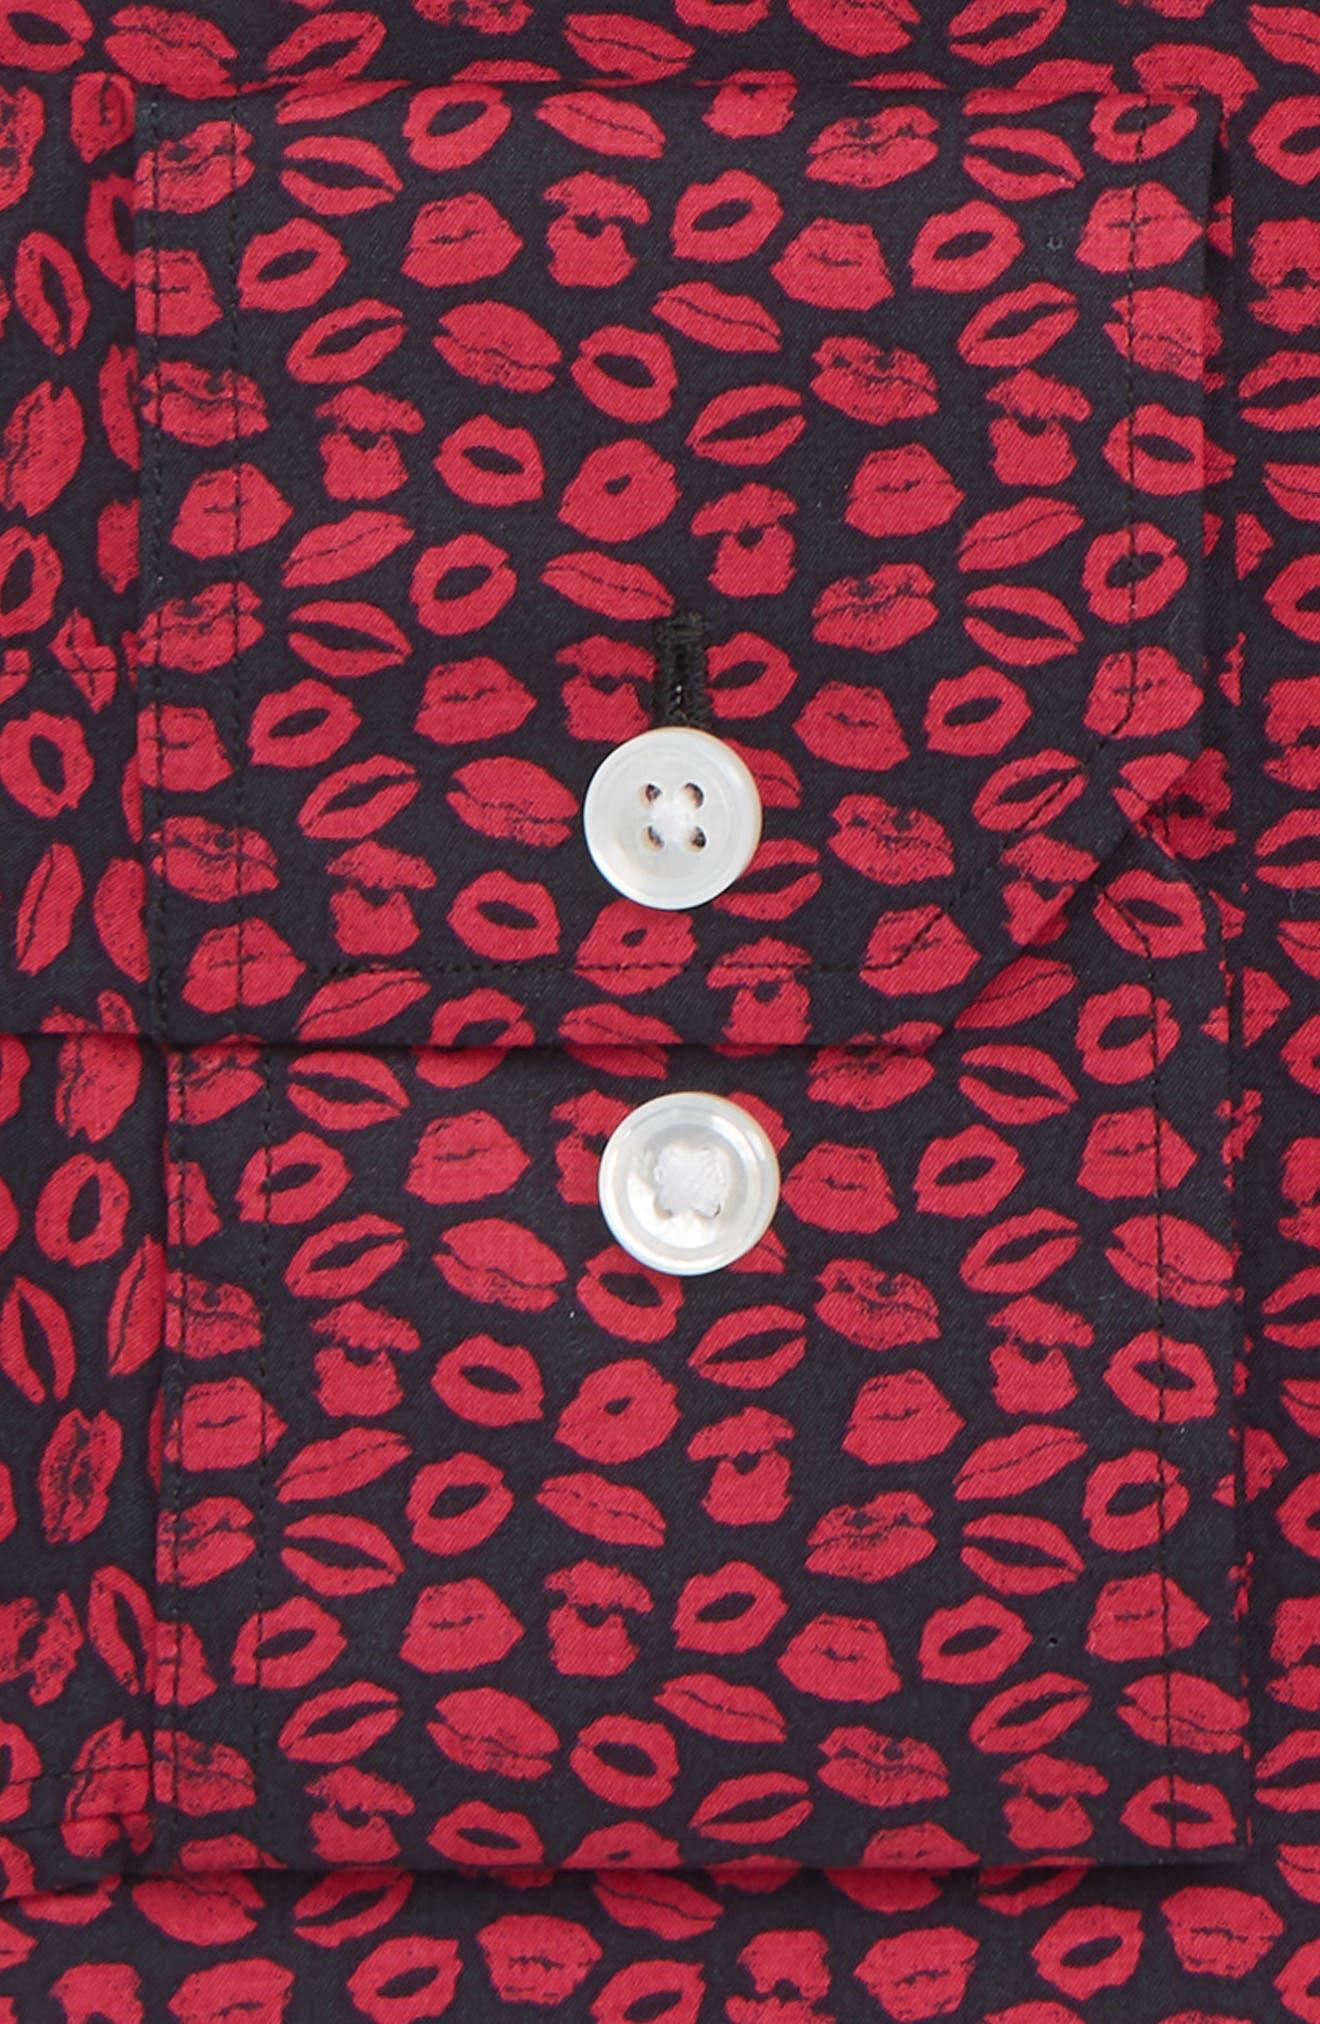 XOXO Slim Fit Stretch Print Dress Shirt,                             Alternate thumbnail 2, color,                             PINK